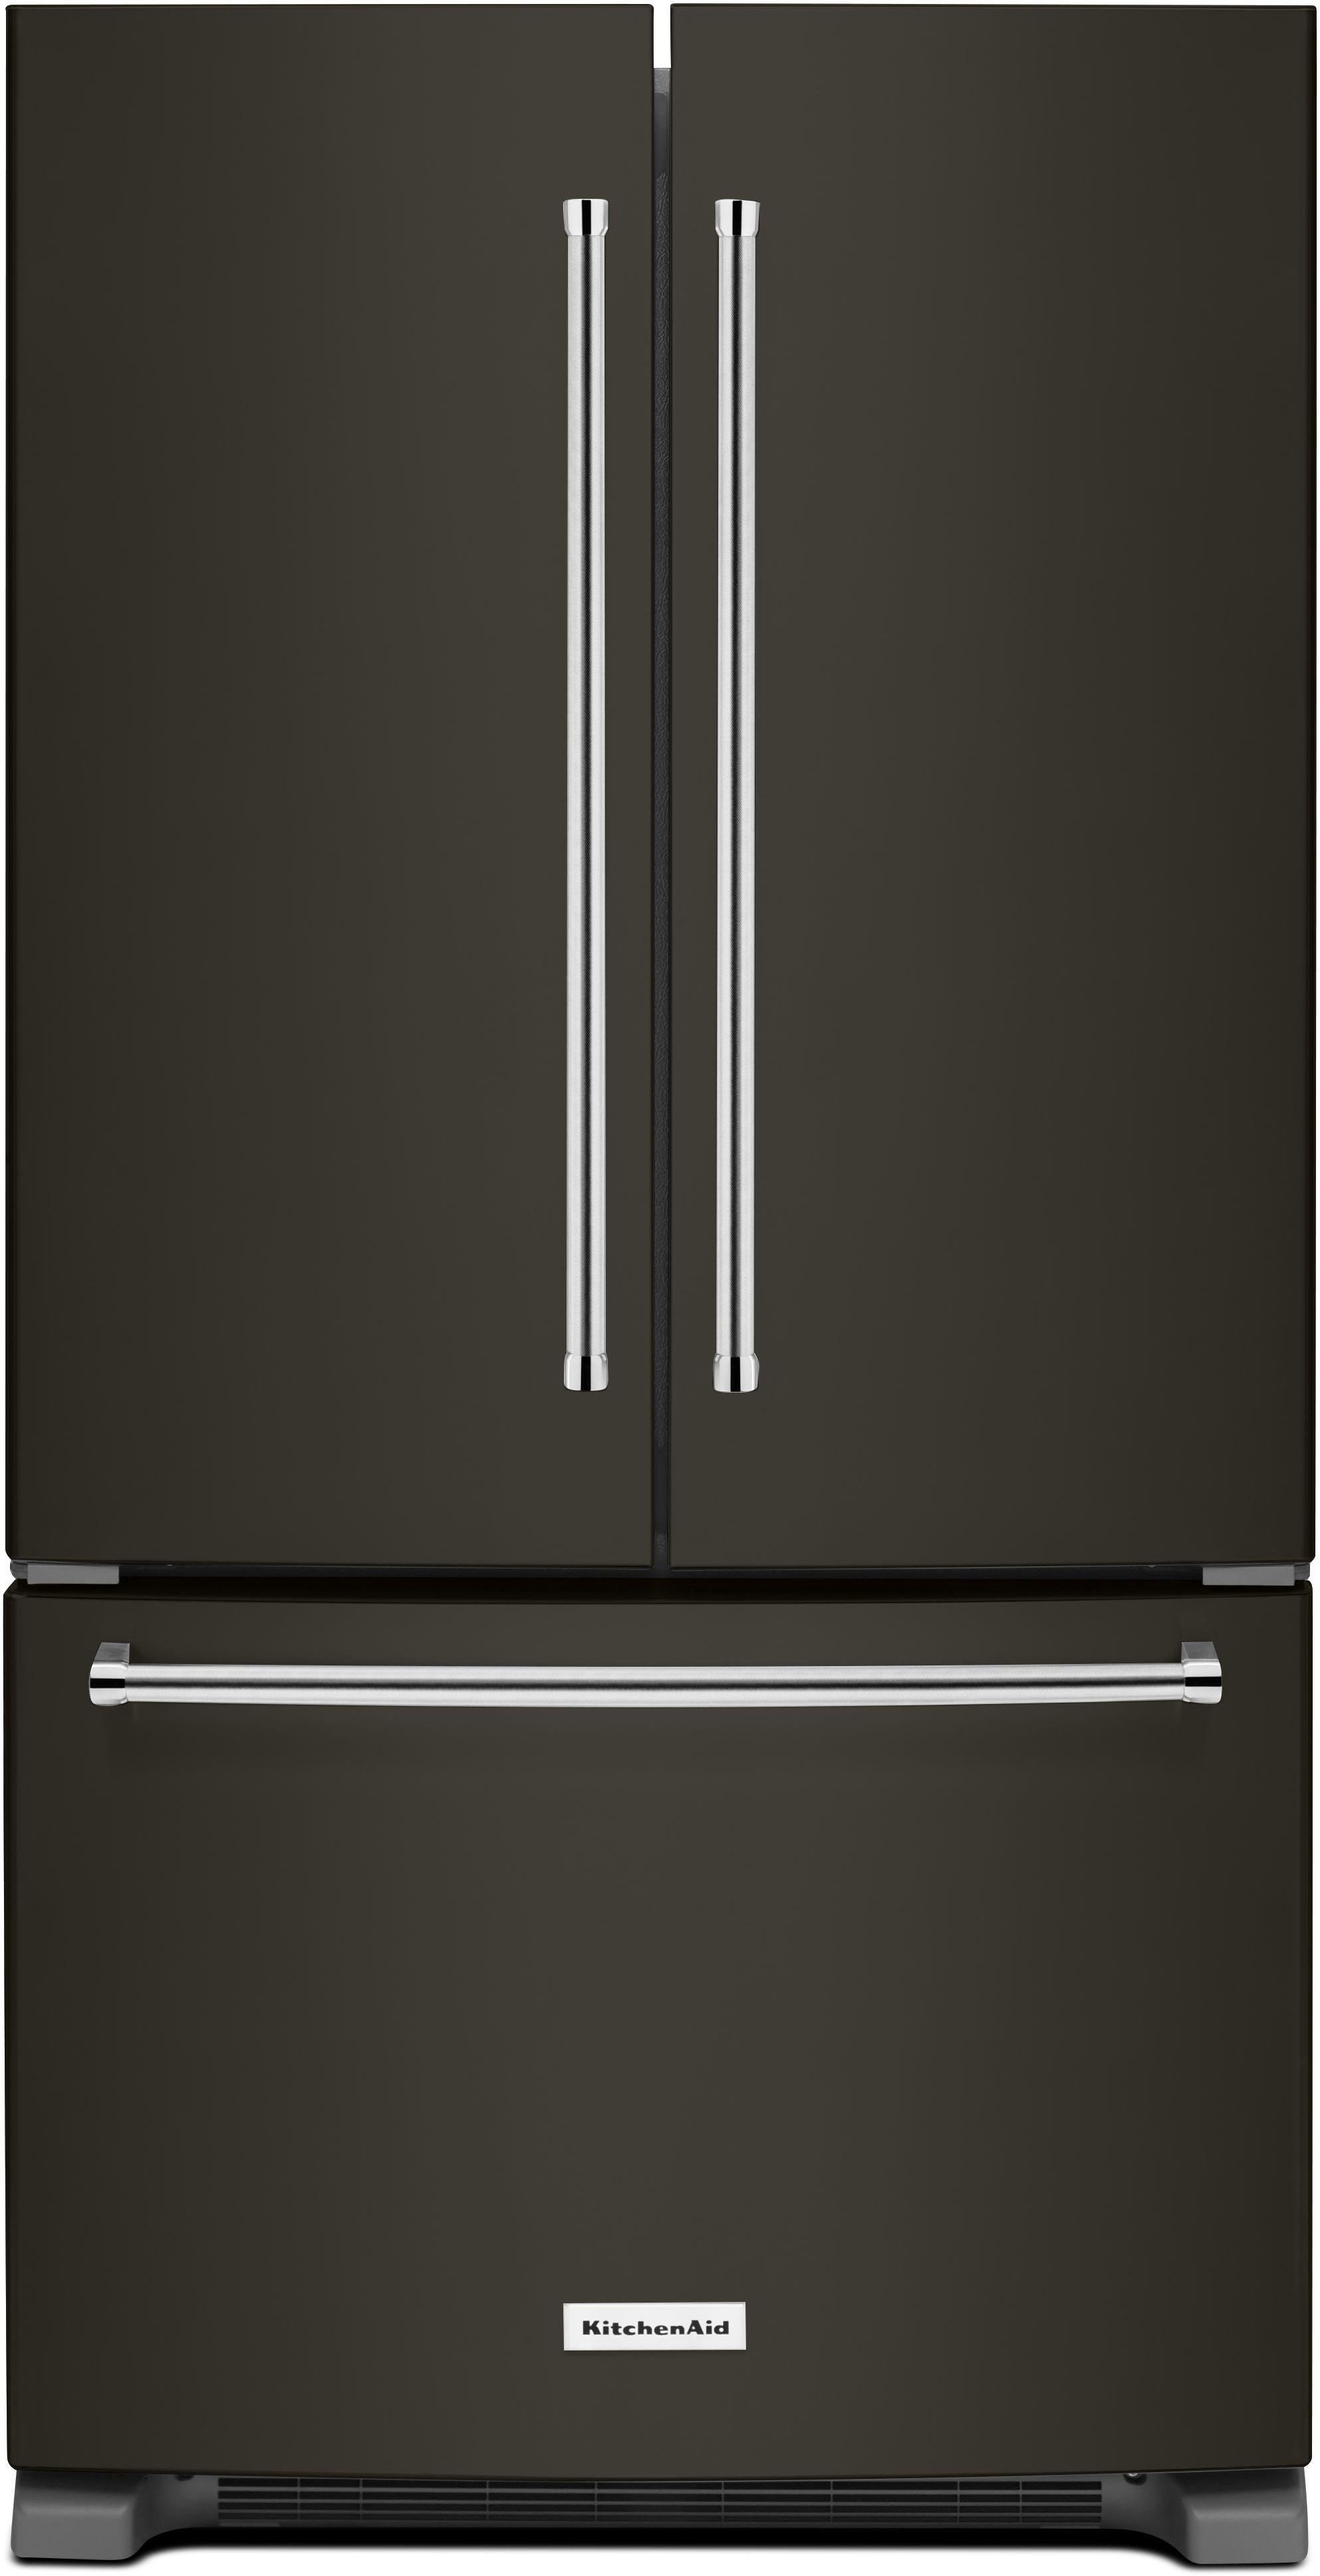 Tremendous Counter Depth Refrigerator Douglass Appliance Beutiful Home Inspiration Ommitmahrainfo